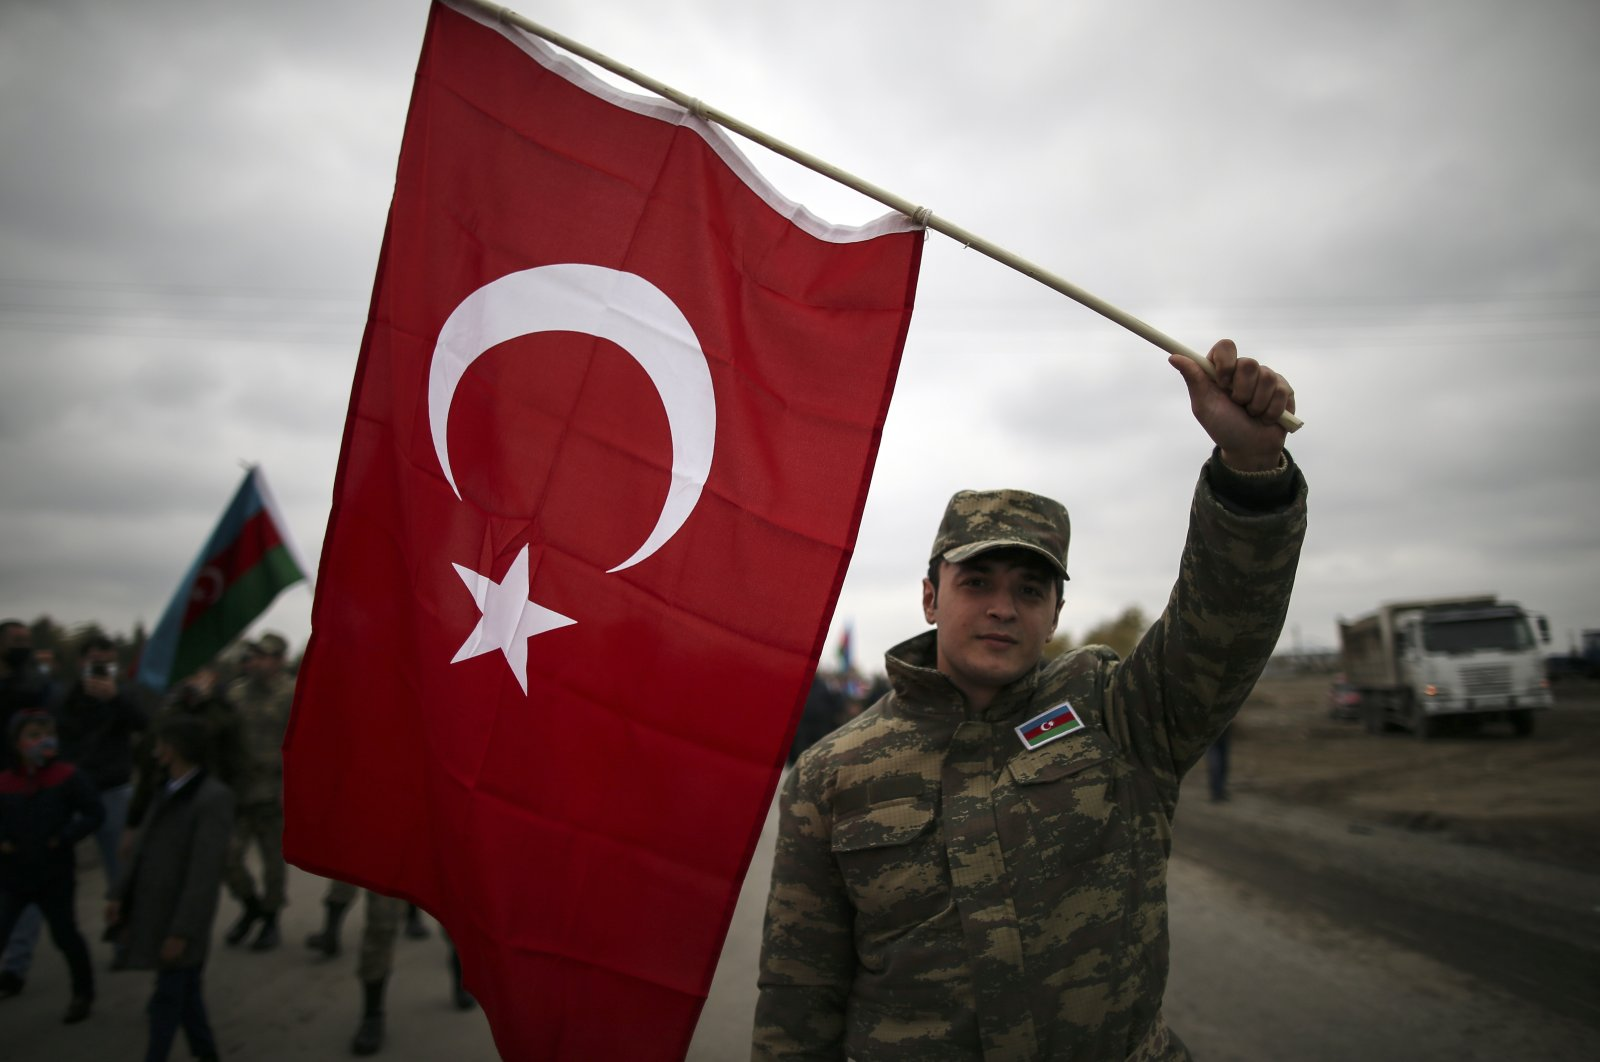 An Azerbaijani soldier holds a Turkish national flag as he celebrates the transfer of the Lachin region to Azerbaijan's control, in Aghjabadi, Azerbaijan, Dec. 1, 2020. (AP Photo)